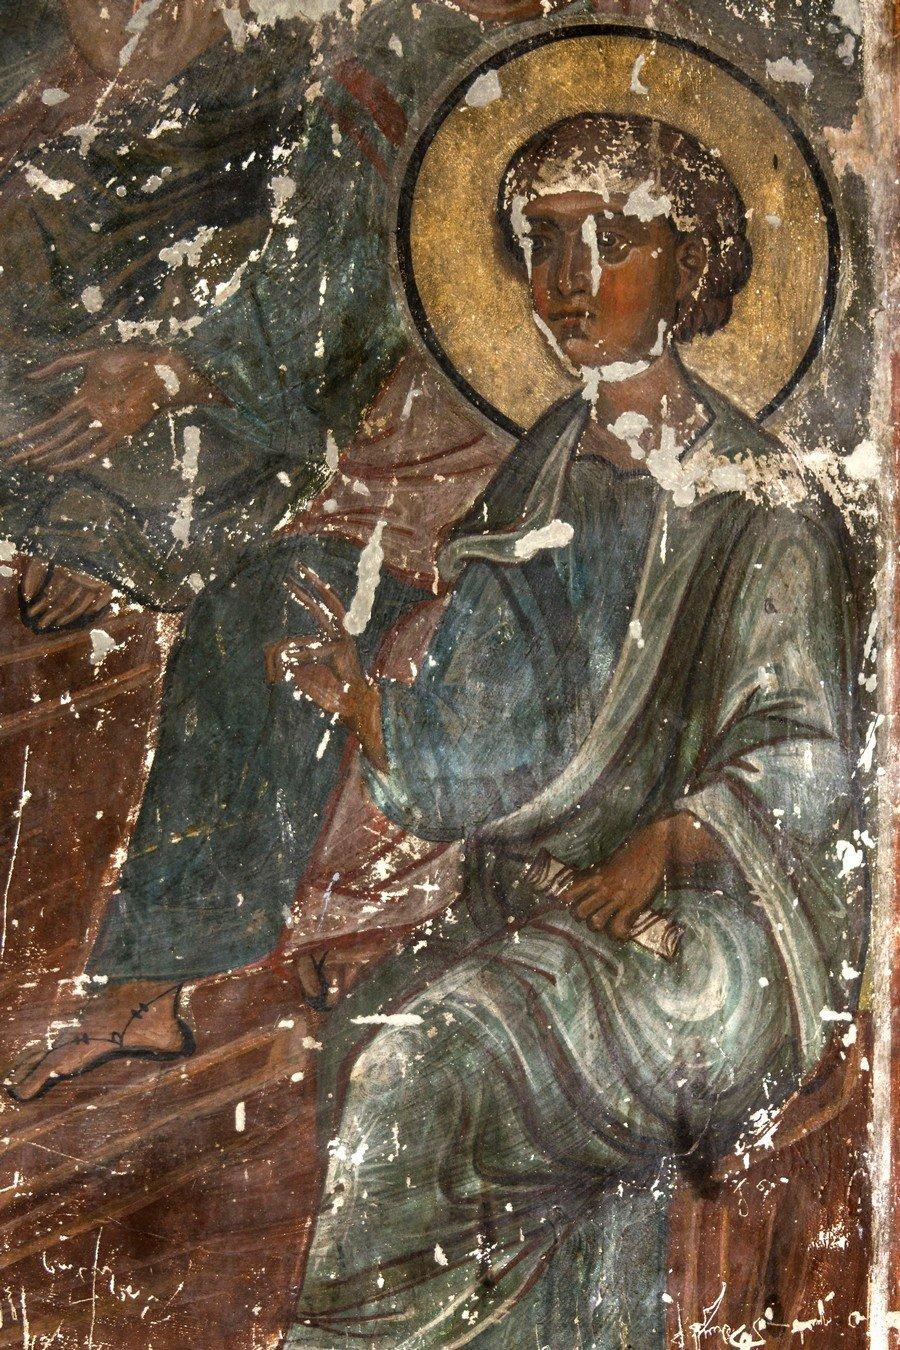 "Святой Апостол. Фрагмент фрески ""Сошествие Святого Духа на Апостолов"". Храм Святого Саввы монастыря Сапара, Грузия. Начало XIV века."